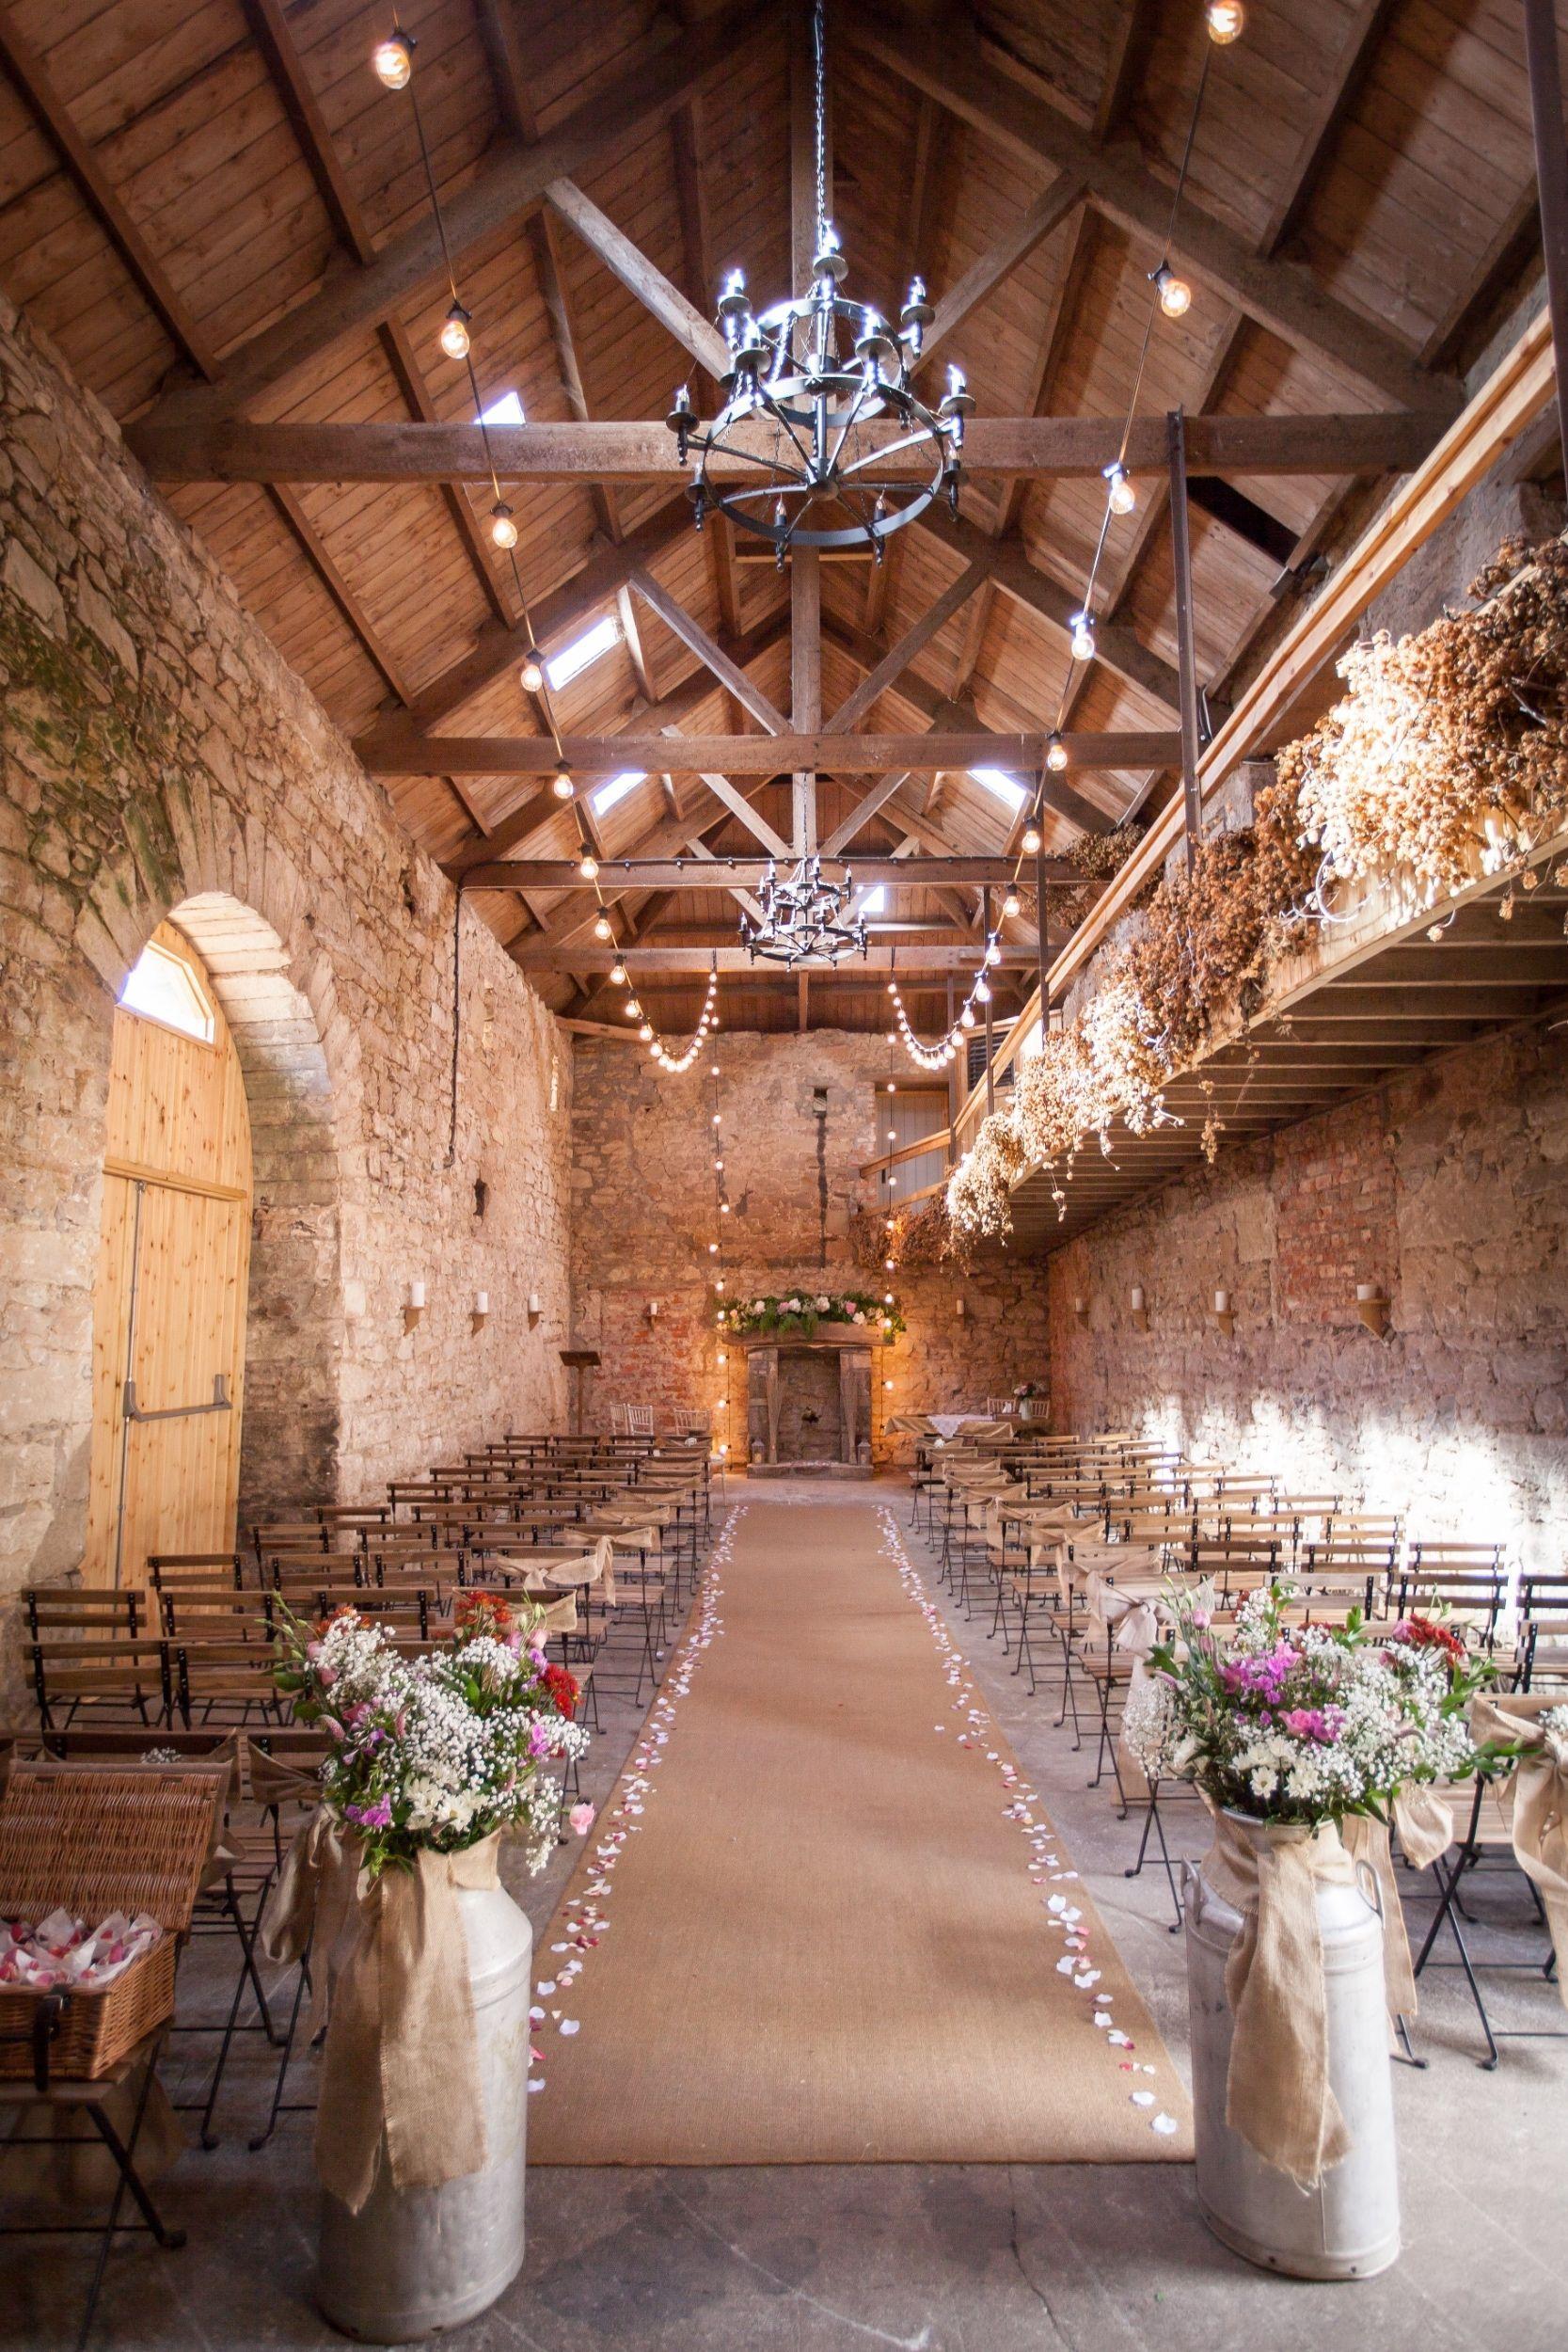 Doxford Barns Wedding Venue Alnwick, Northumberland